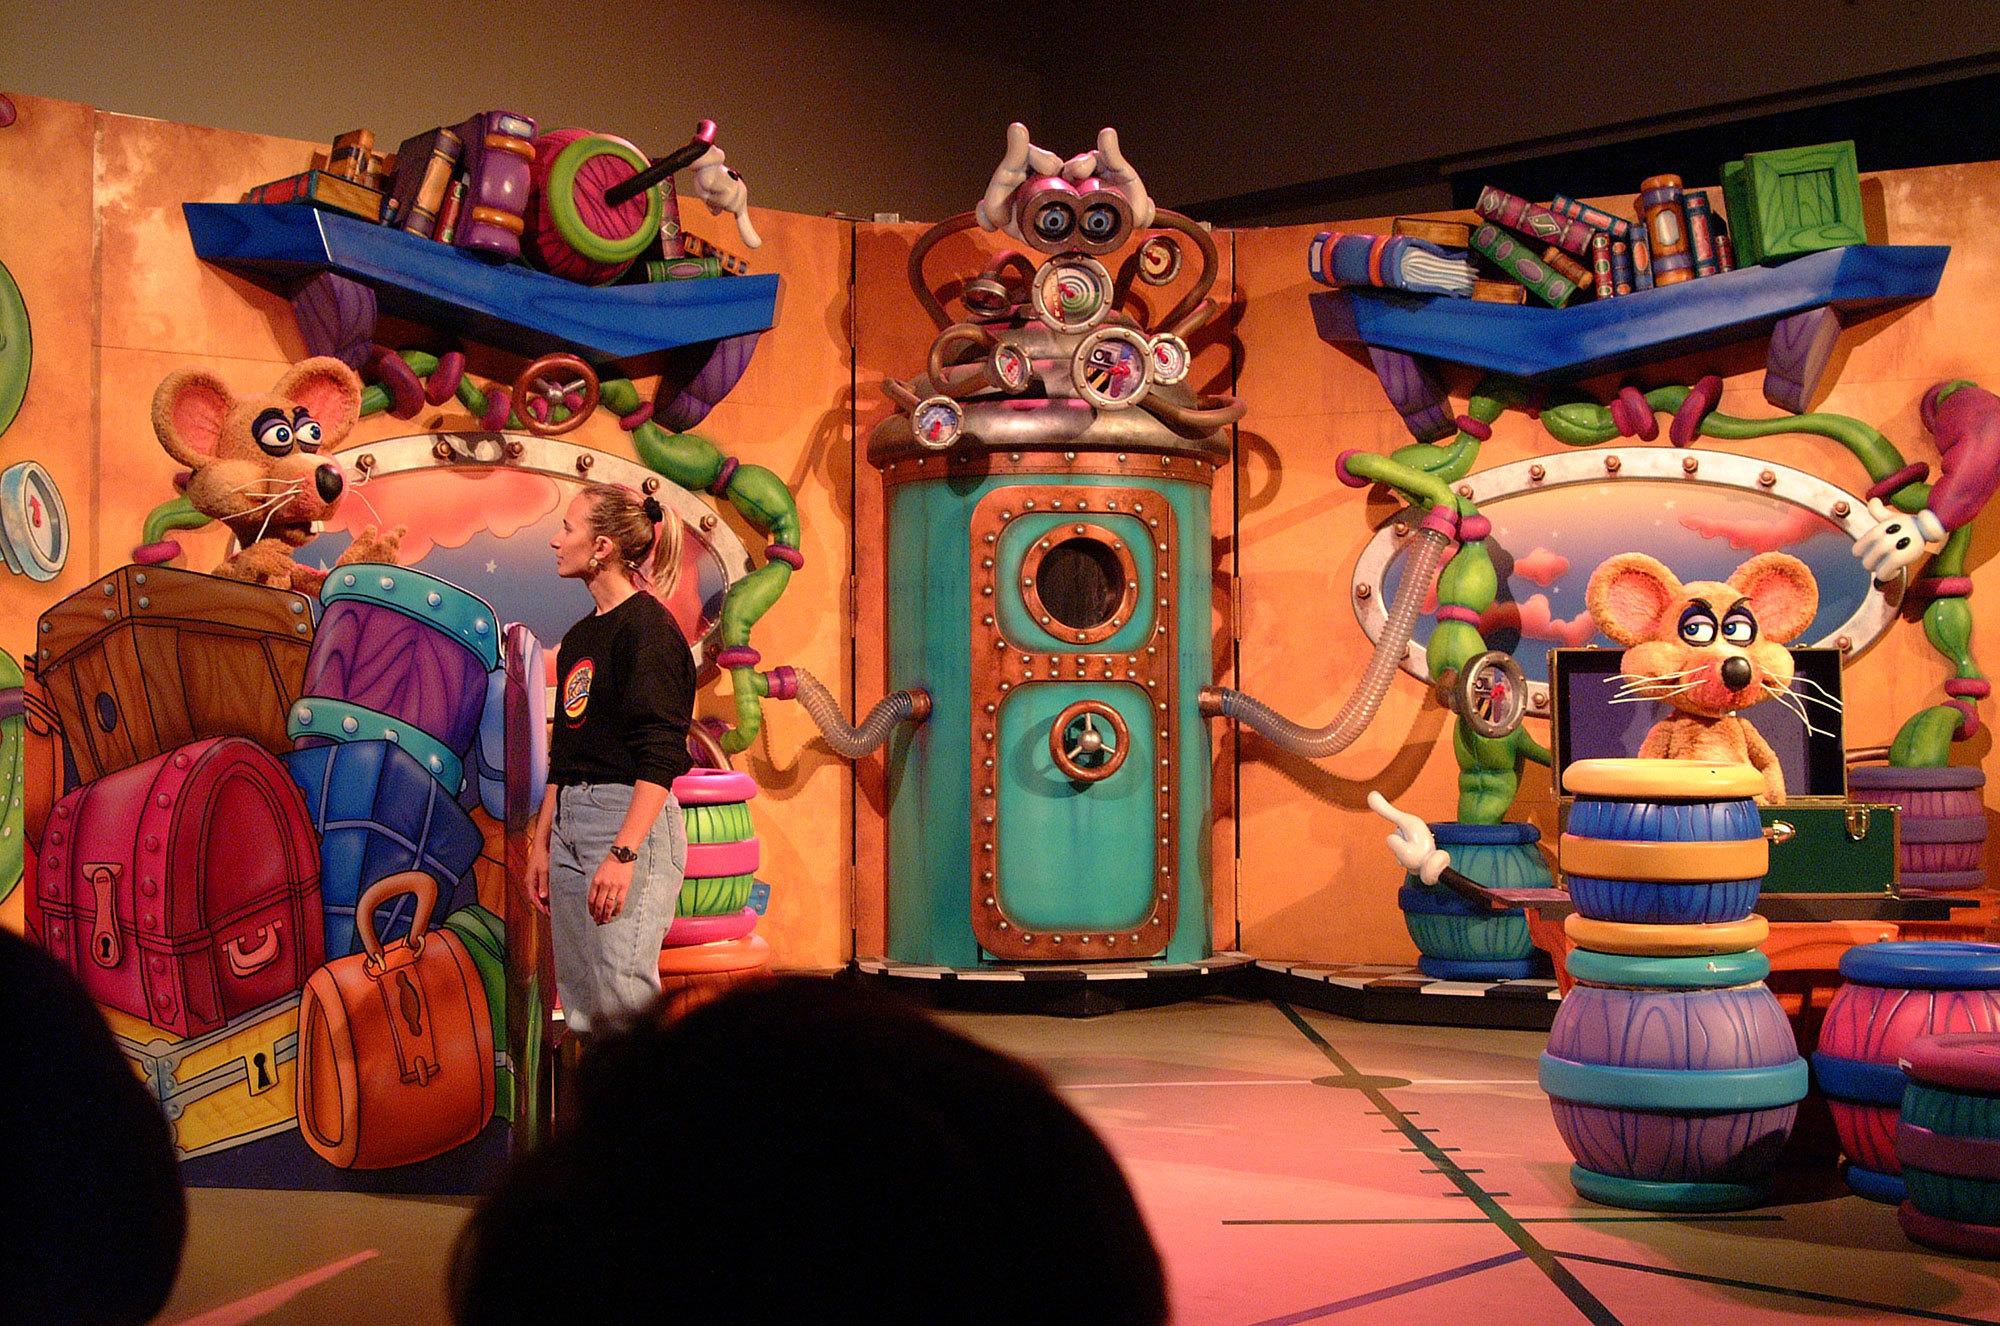 Wacky Stage with Animatronic Characters